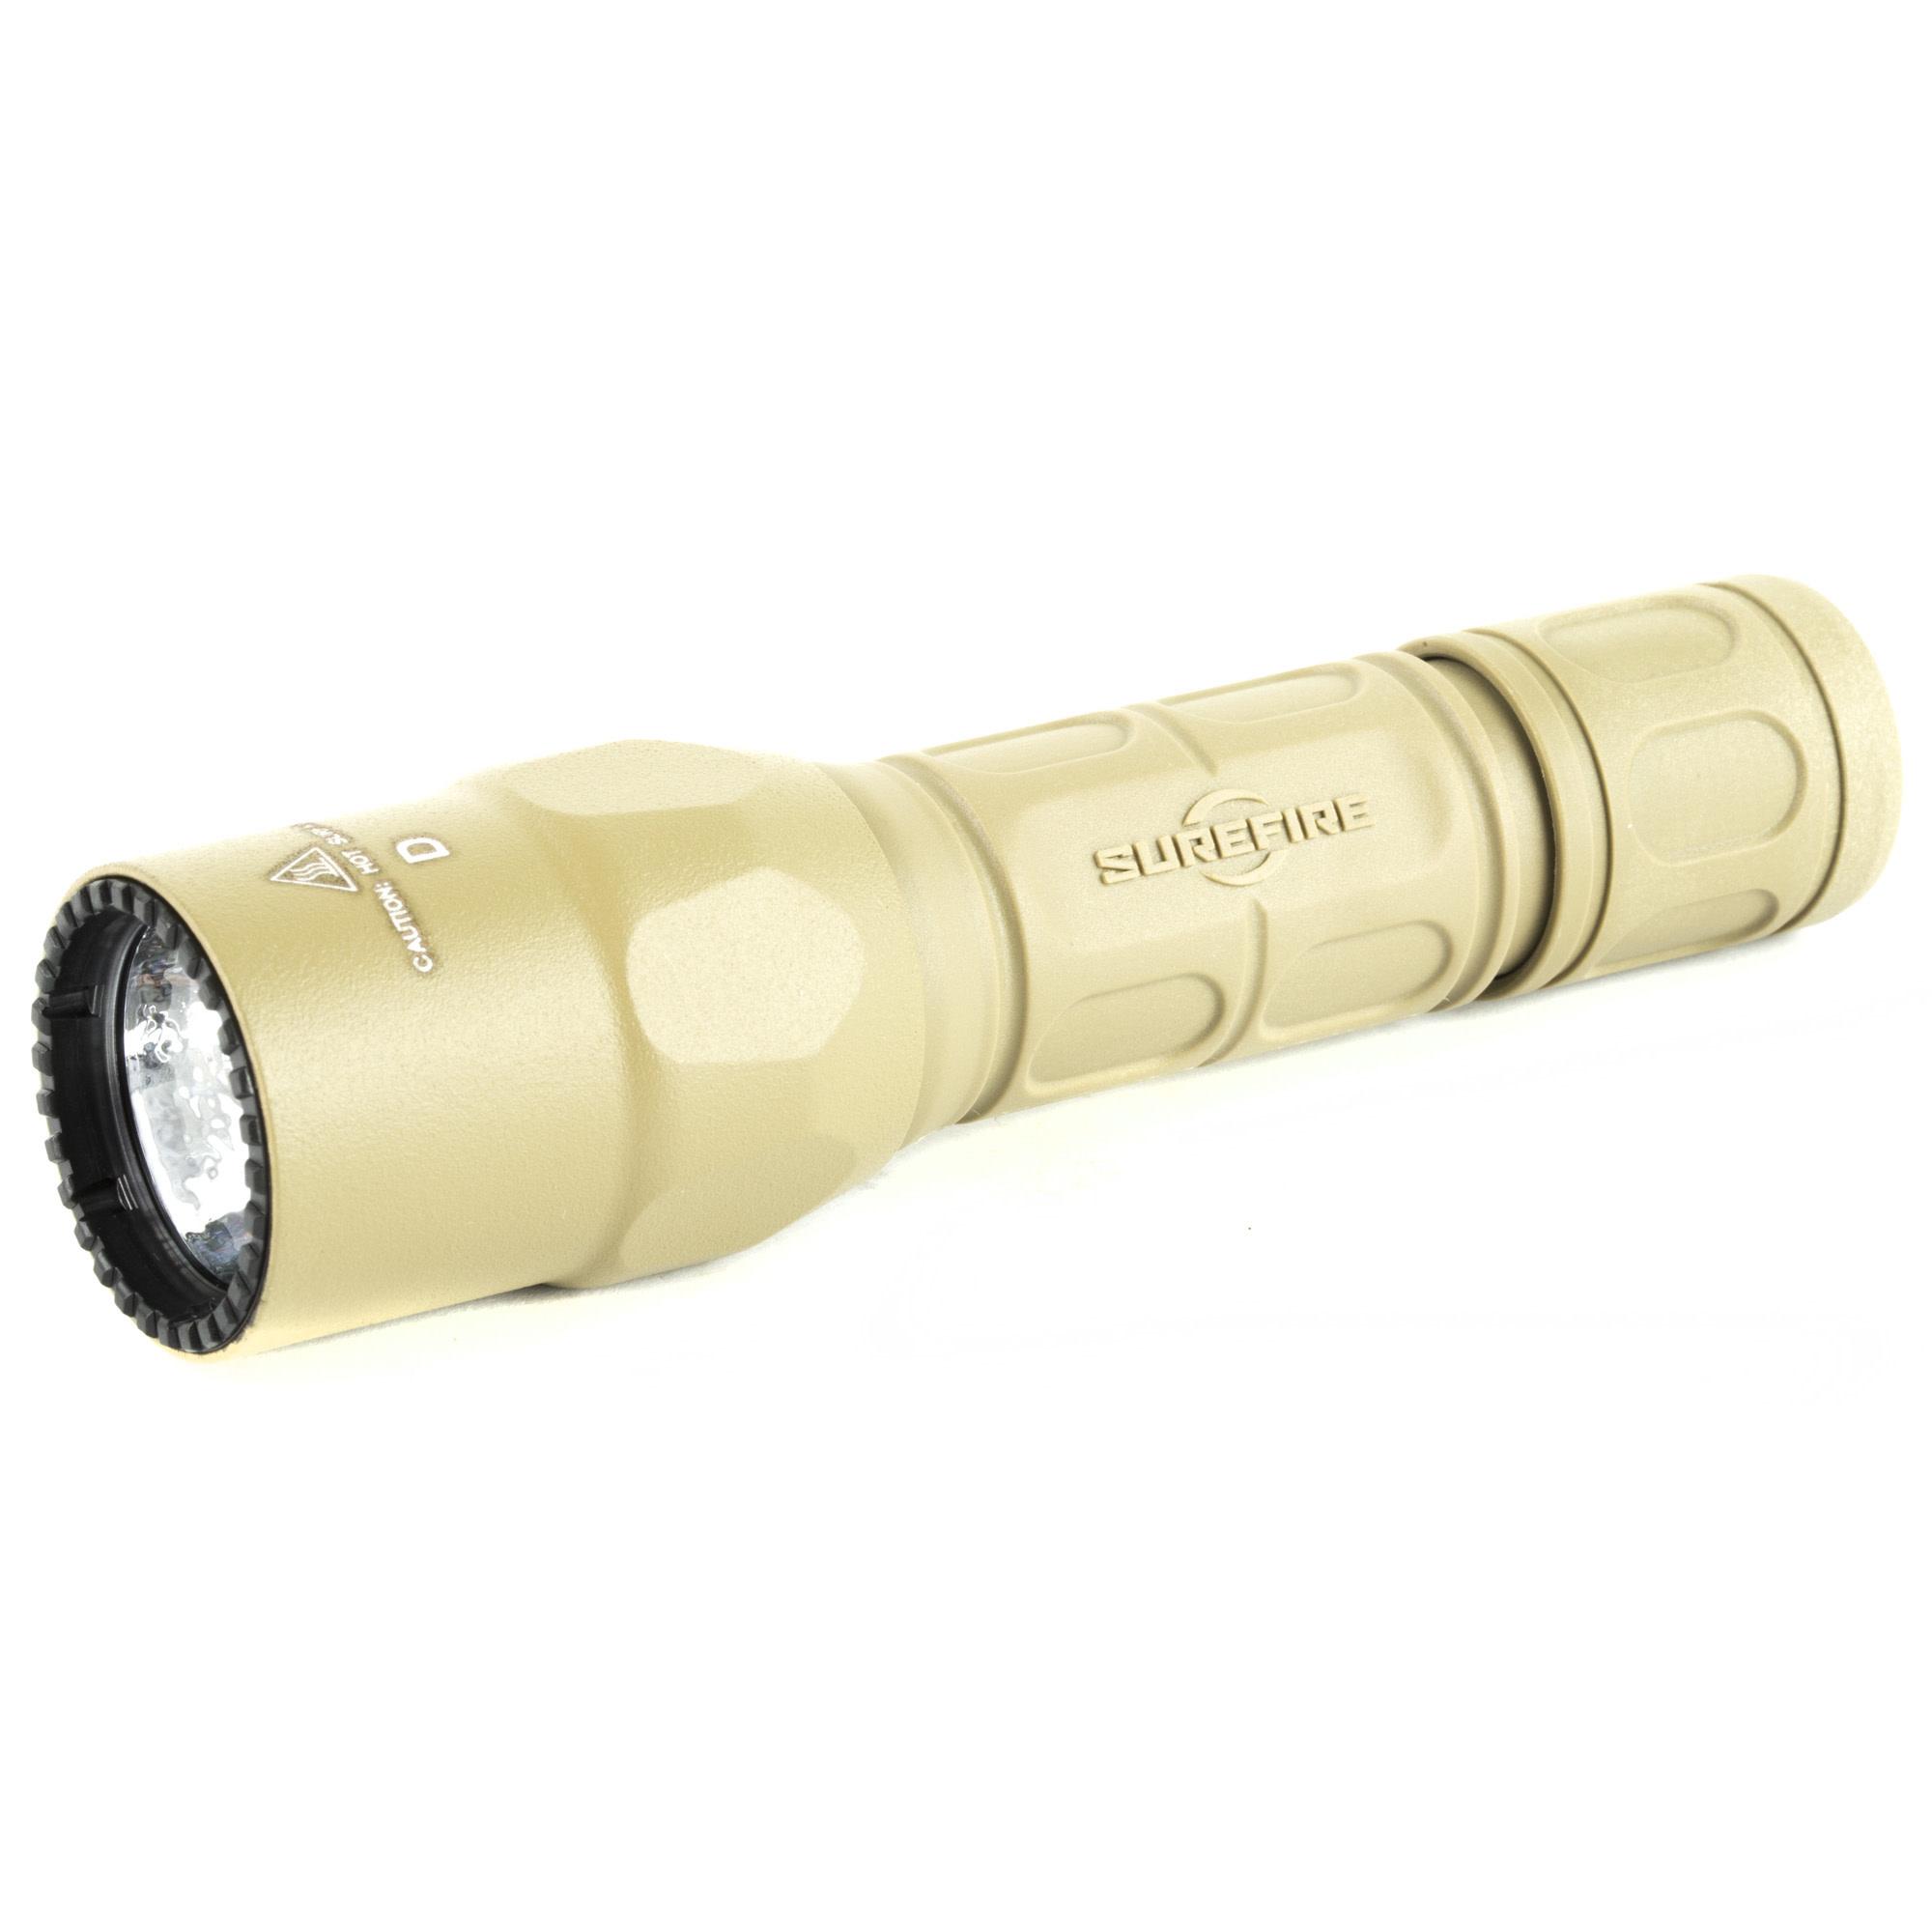 Surefire G2X TACTICAL, 15/320 lumens, Tan